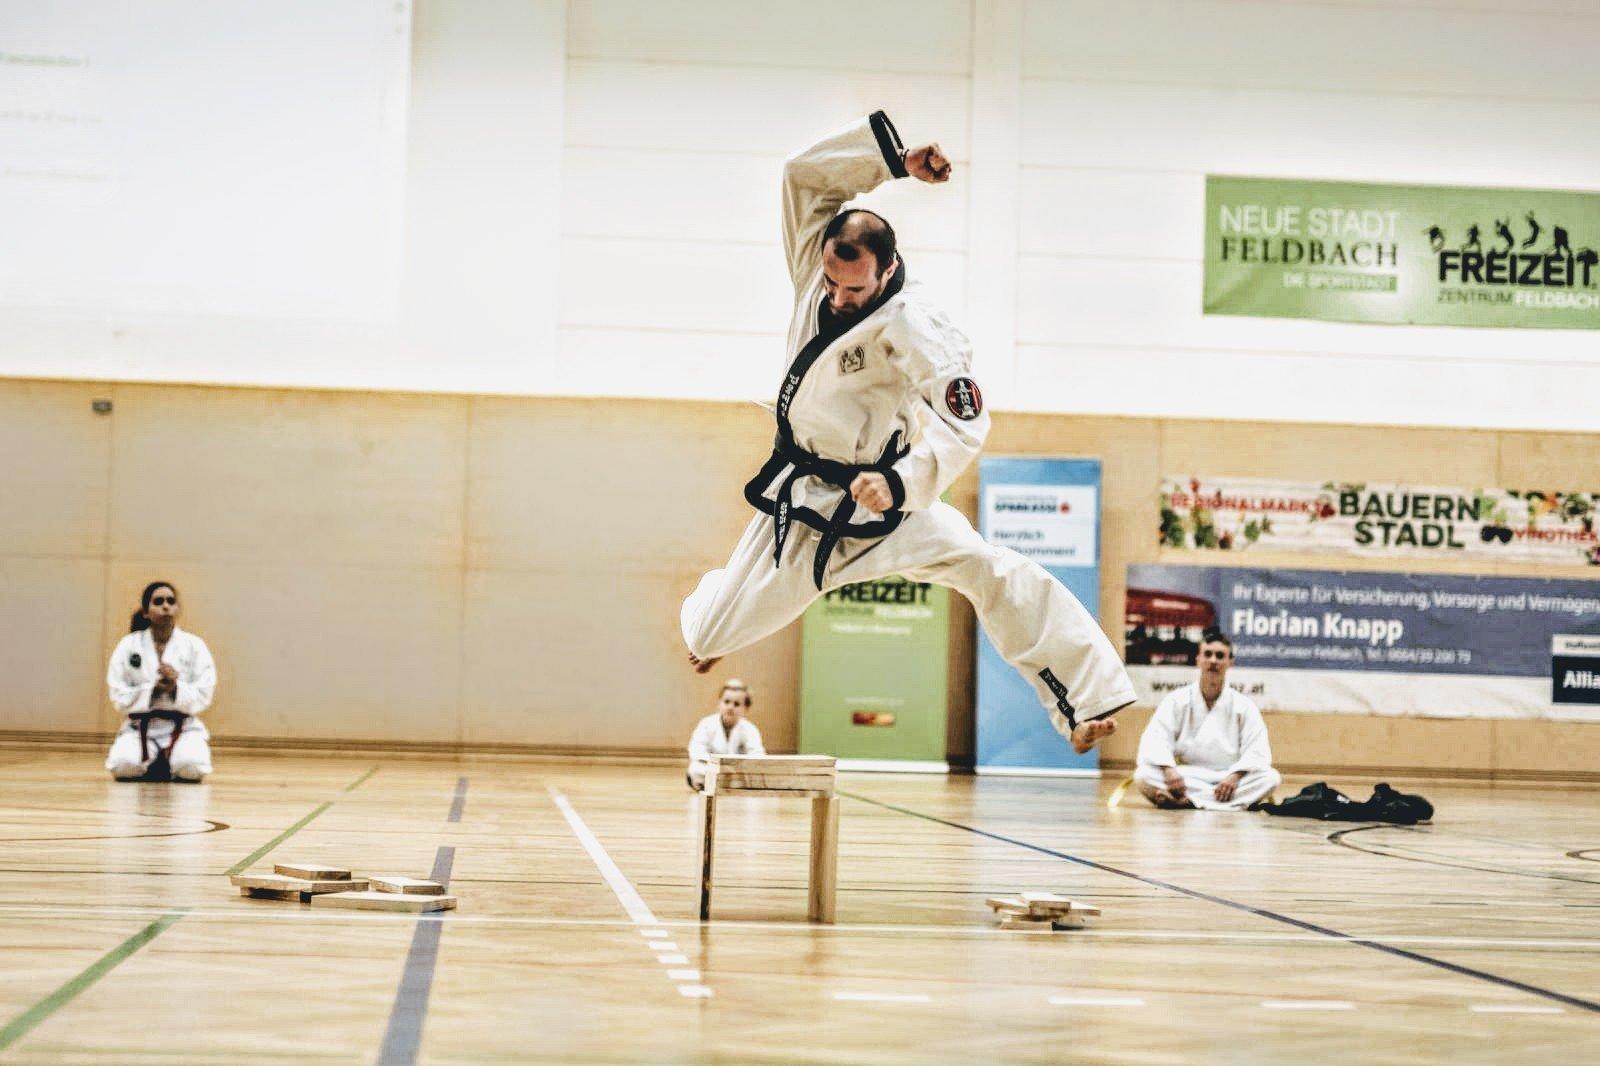 YOUNG-UNG Taekwondo Mein Bezirk Südsteiermark LBS Feldbach